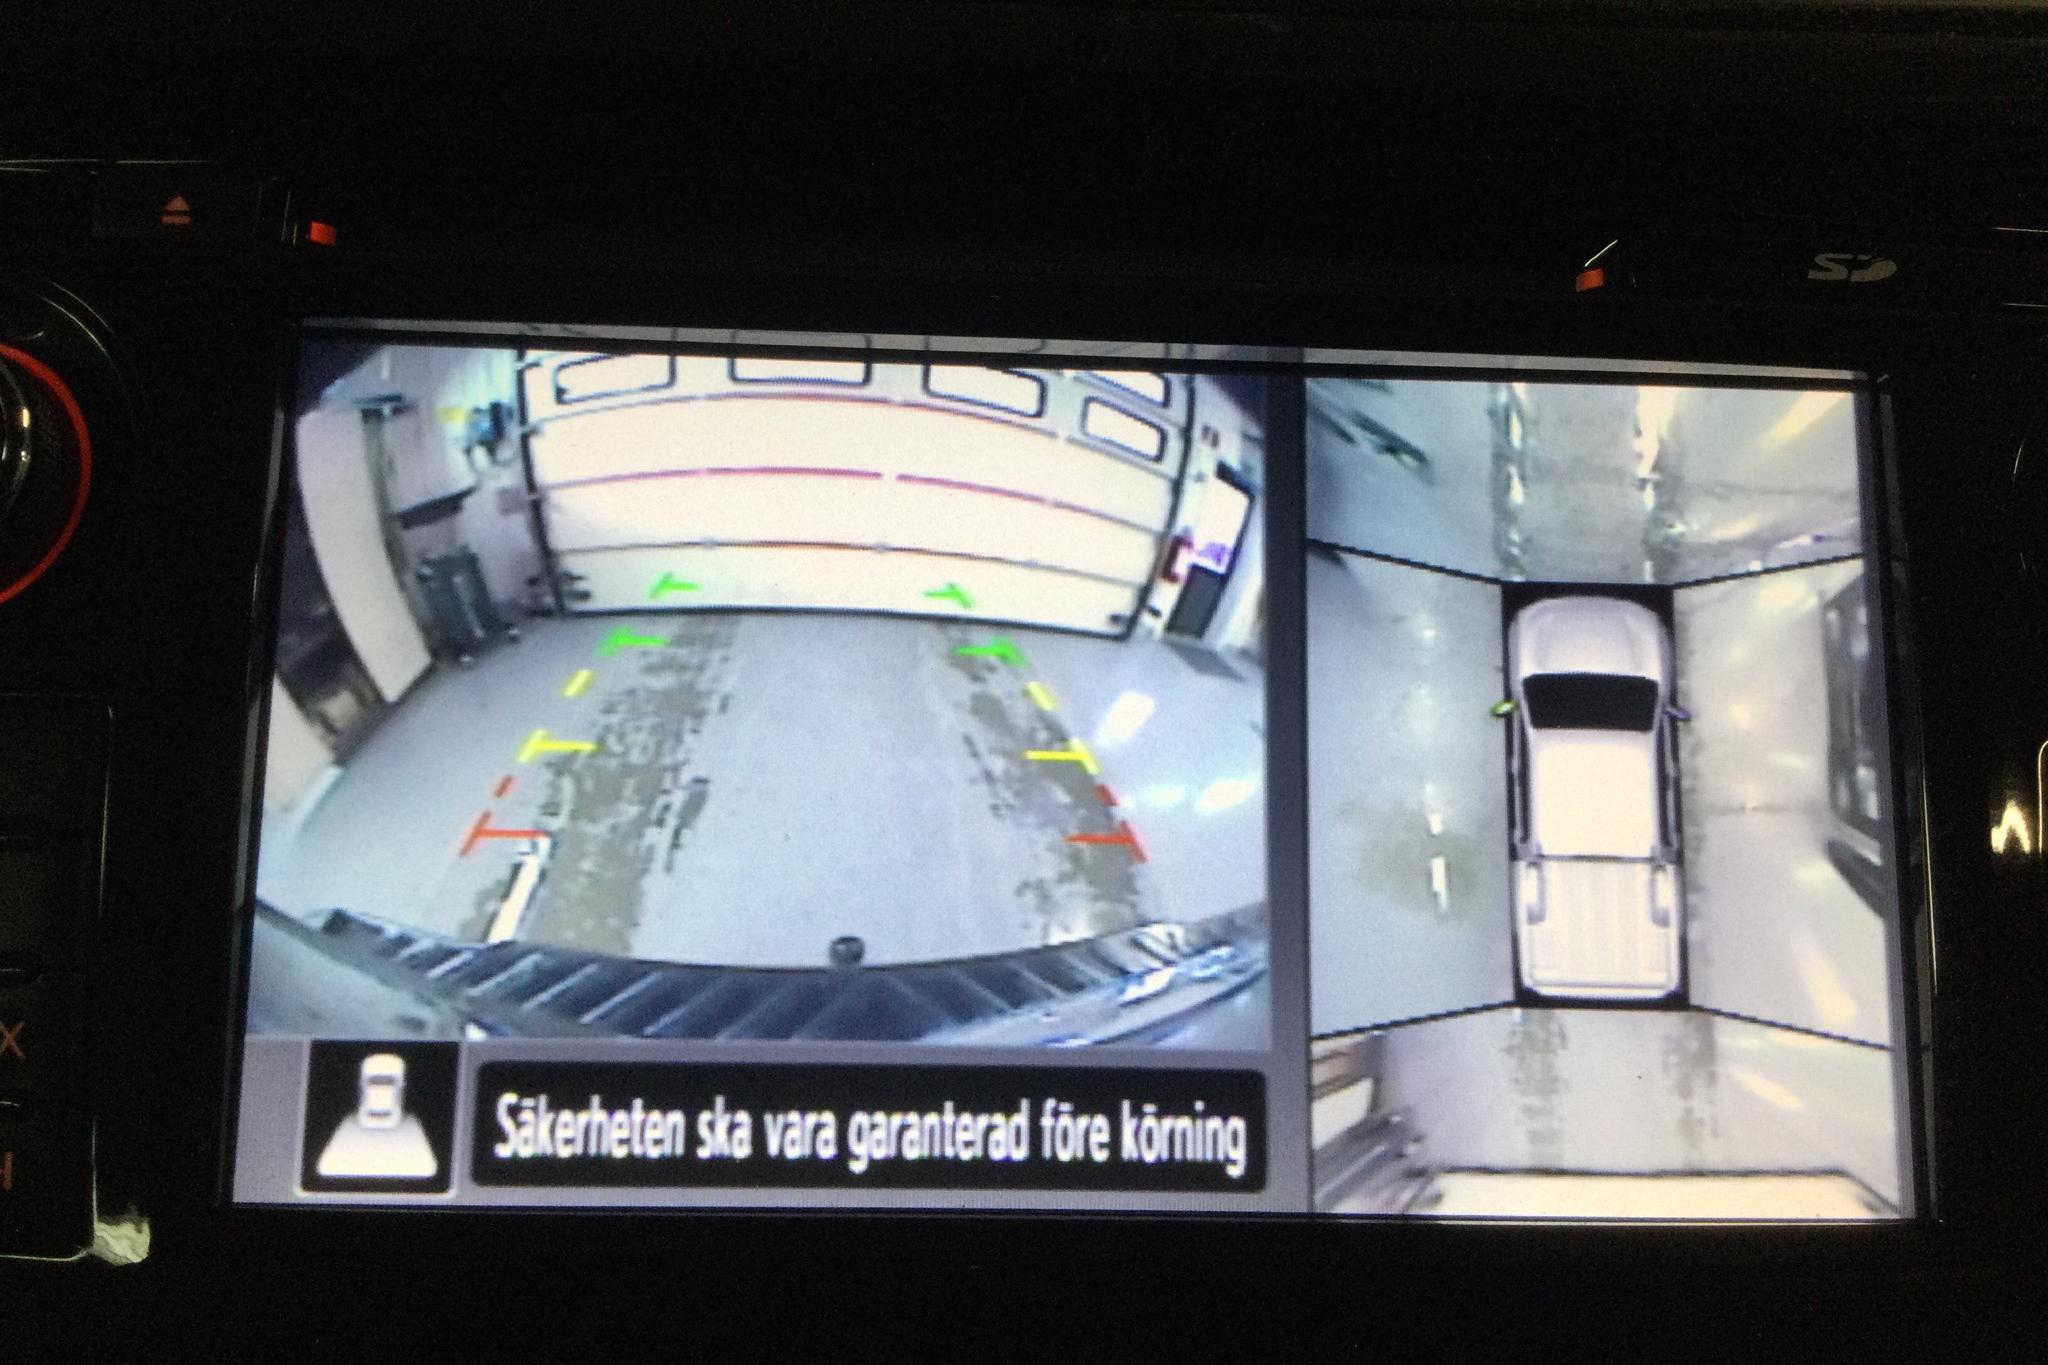 Nissan Navara 2.3 dCi 4x4 (190hk) - 5 813 mil - Automat - svart - 2017